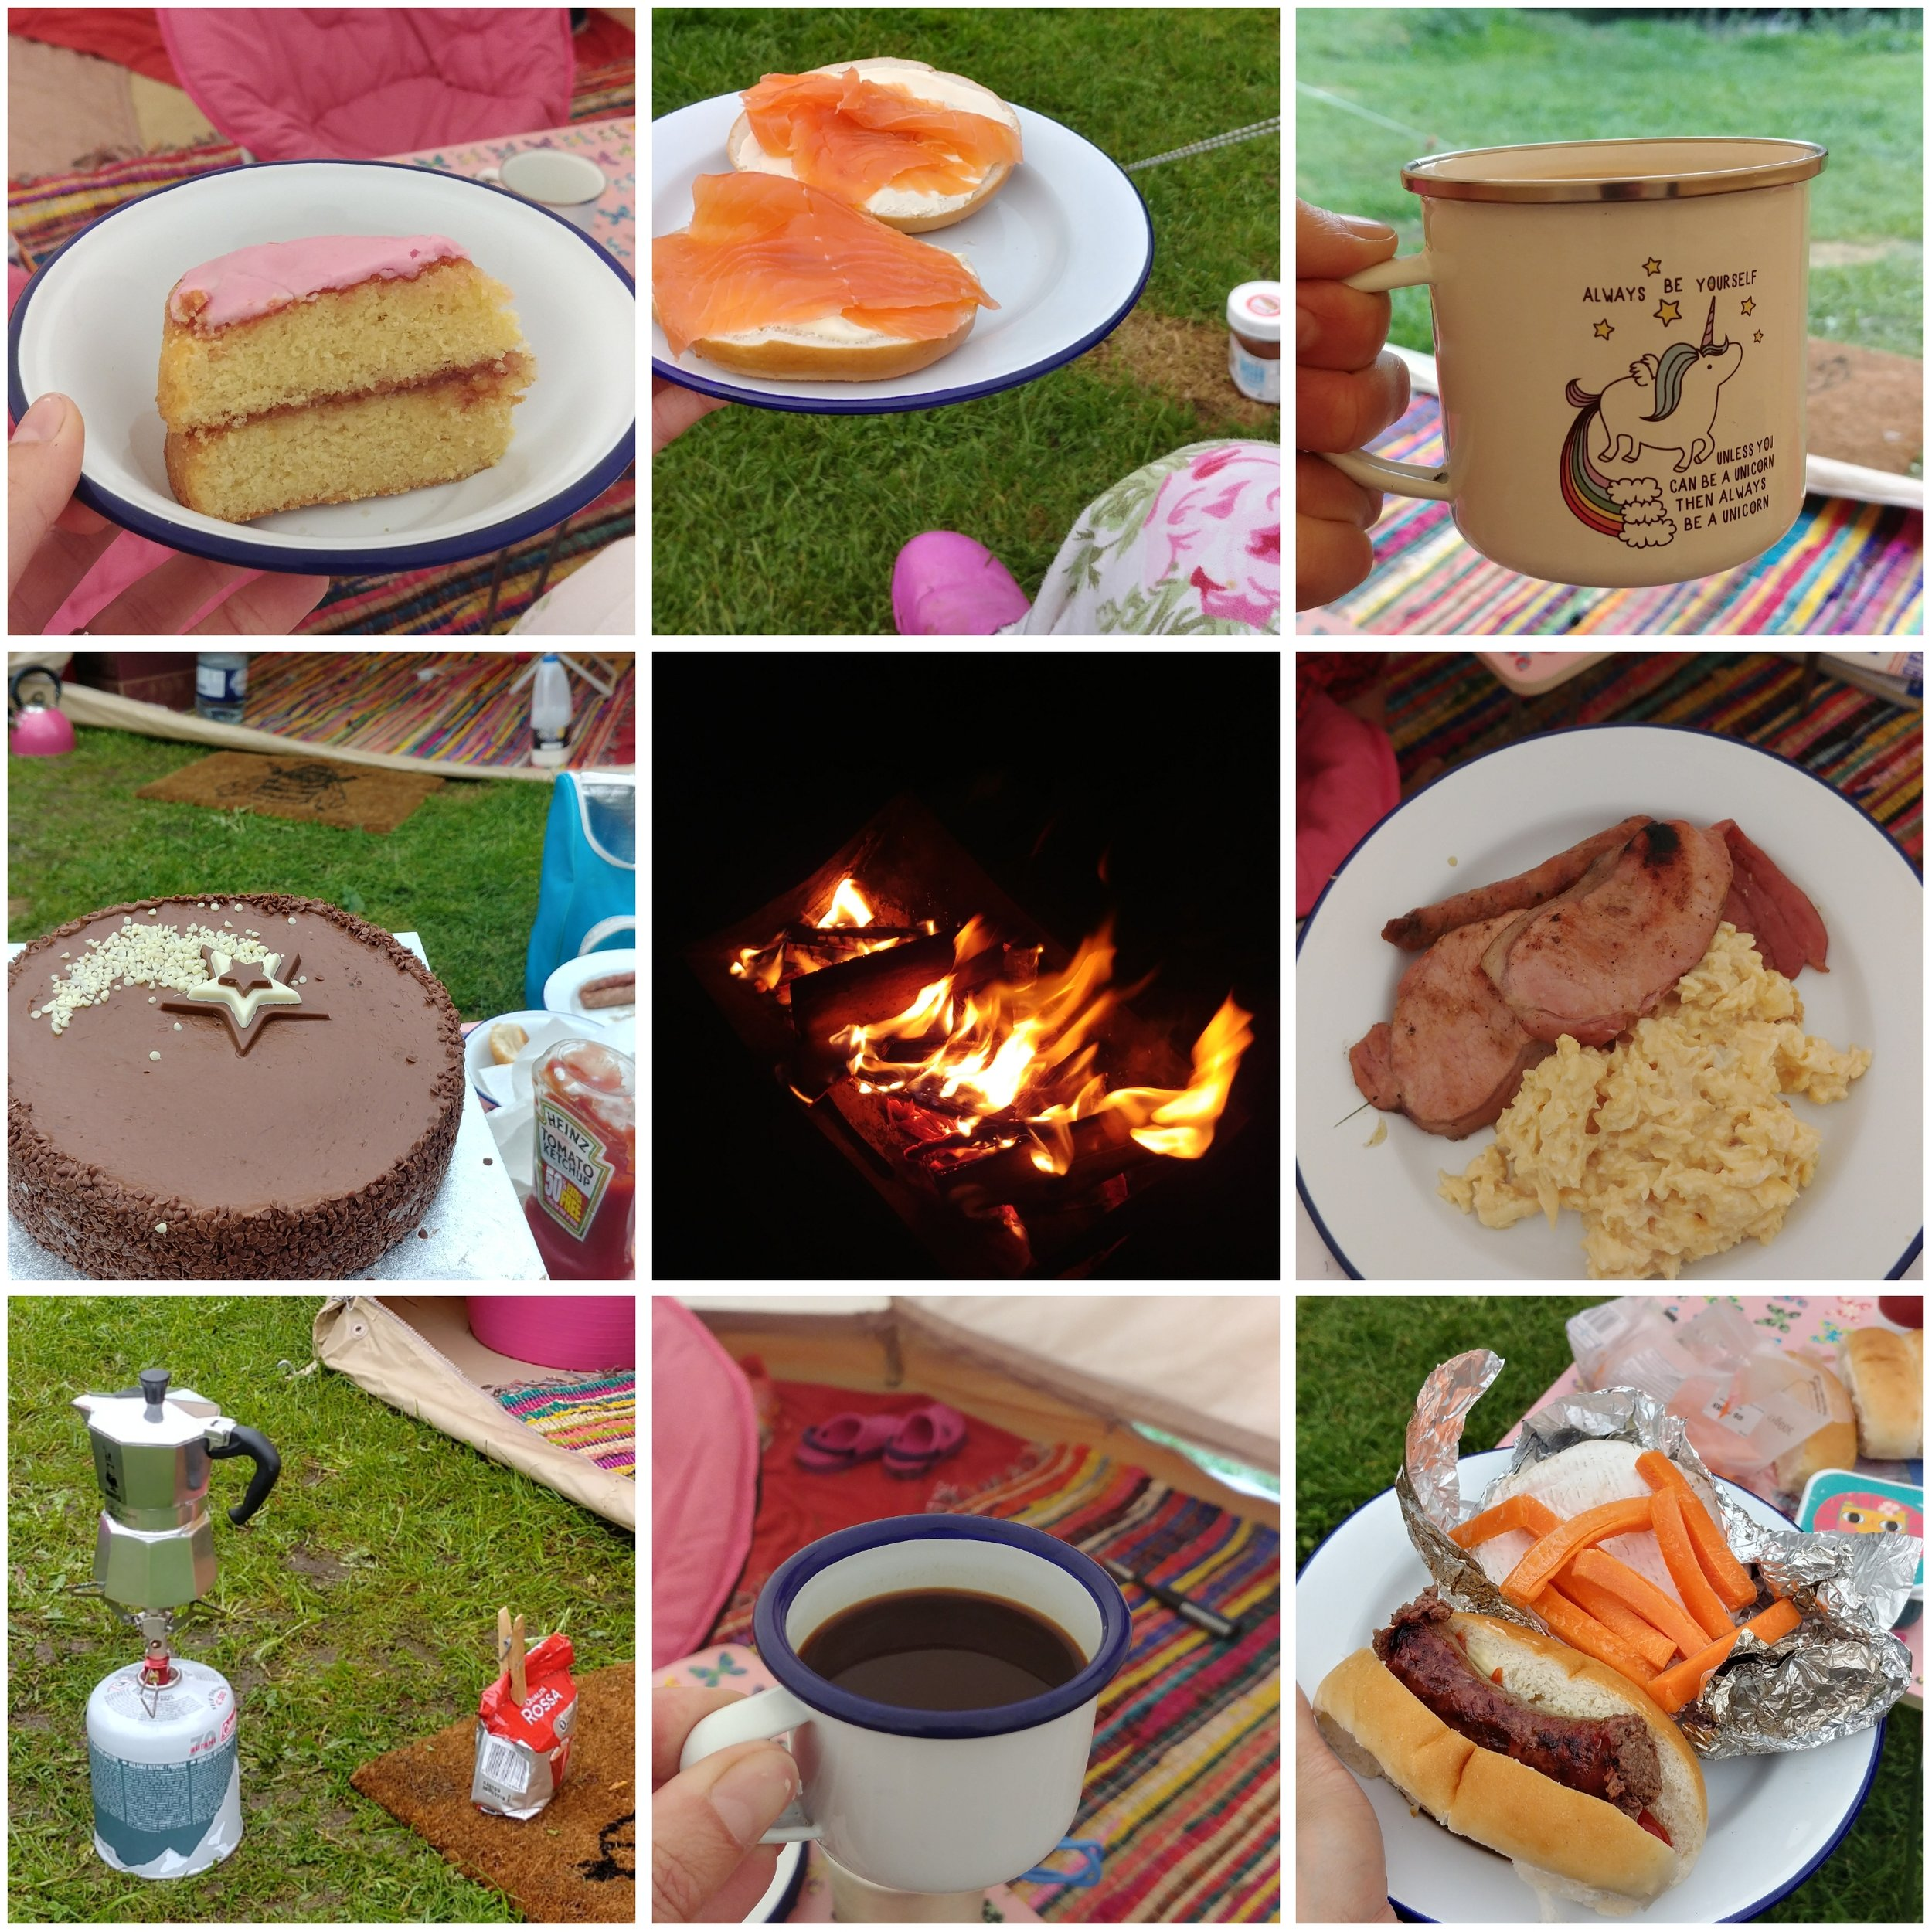 More camping food - mocha pot and ceramic espresso cups essential!